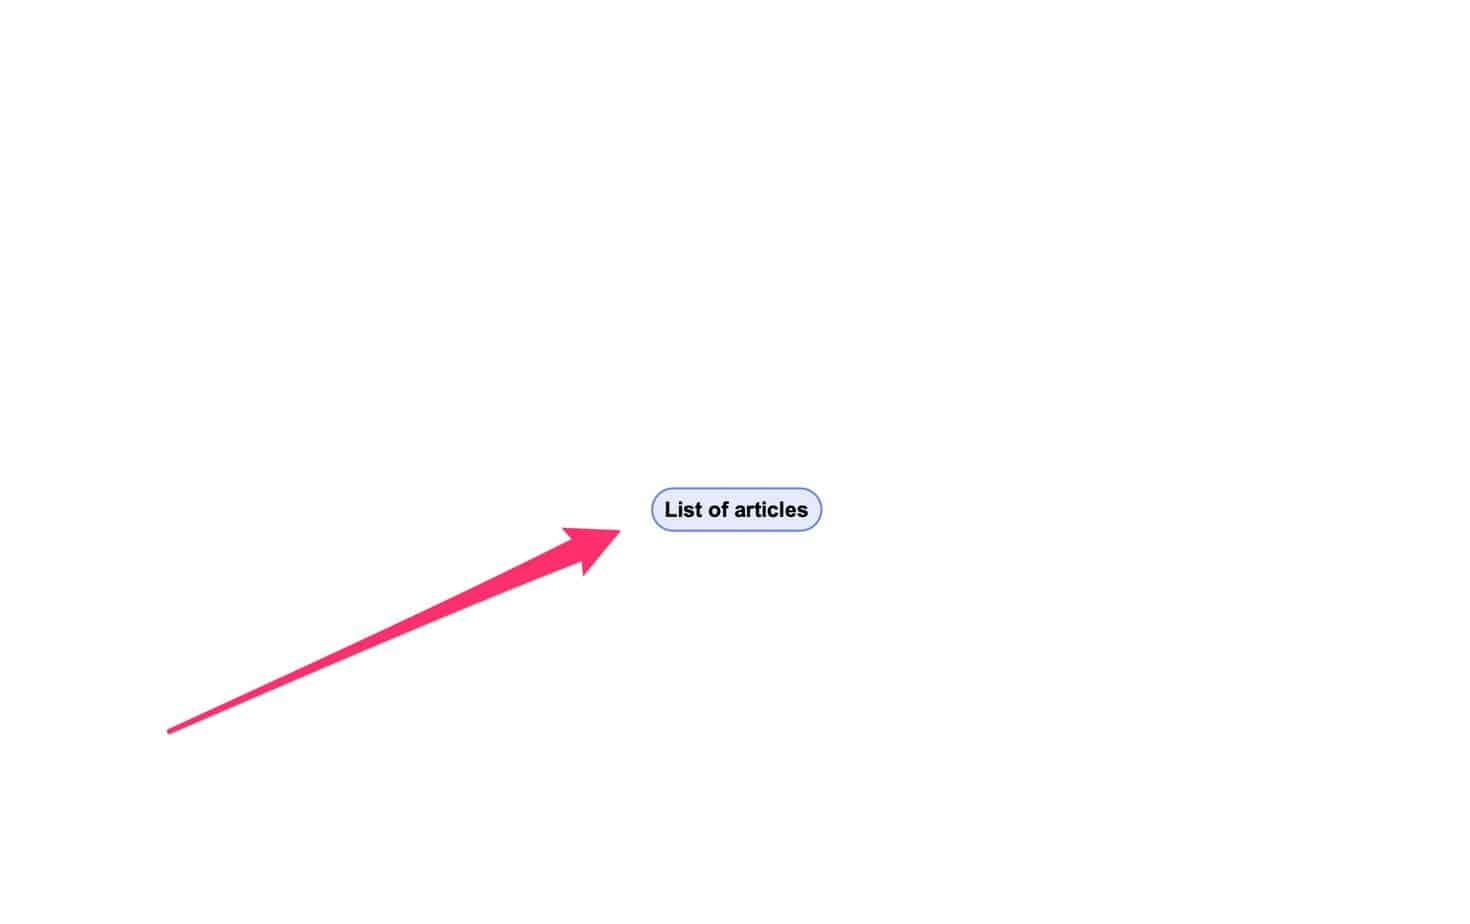 mind map of blog posts